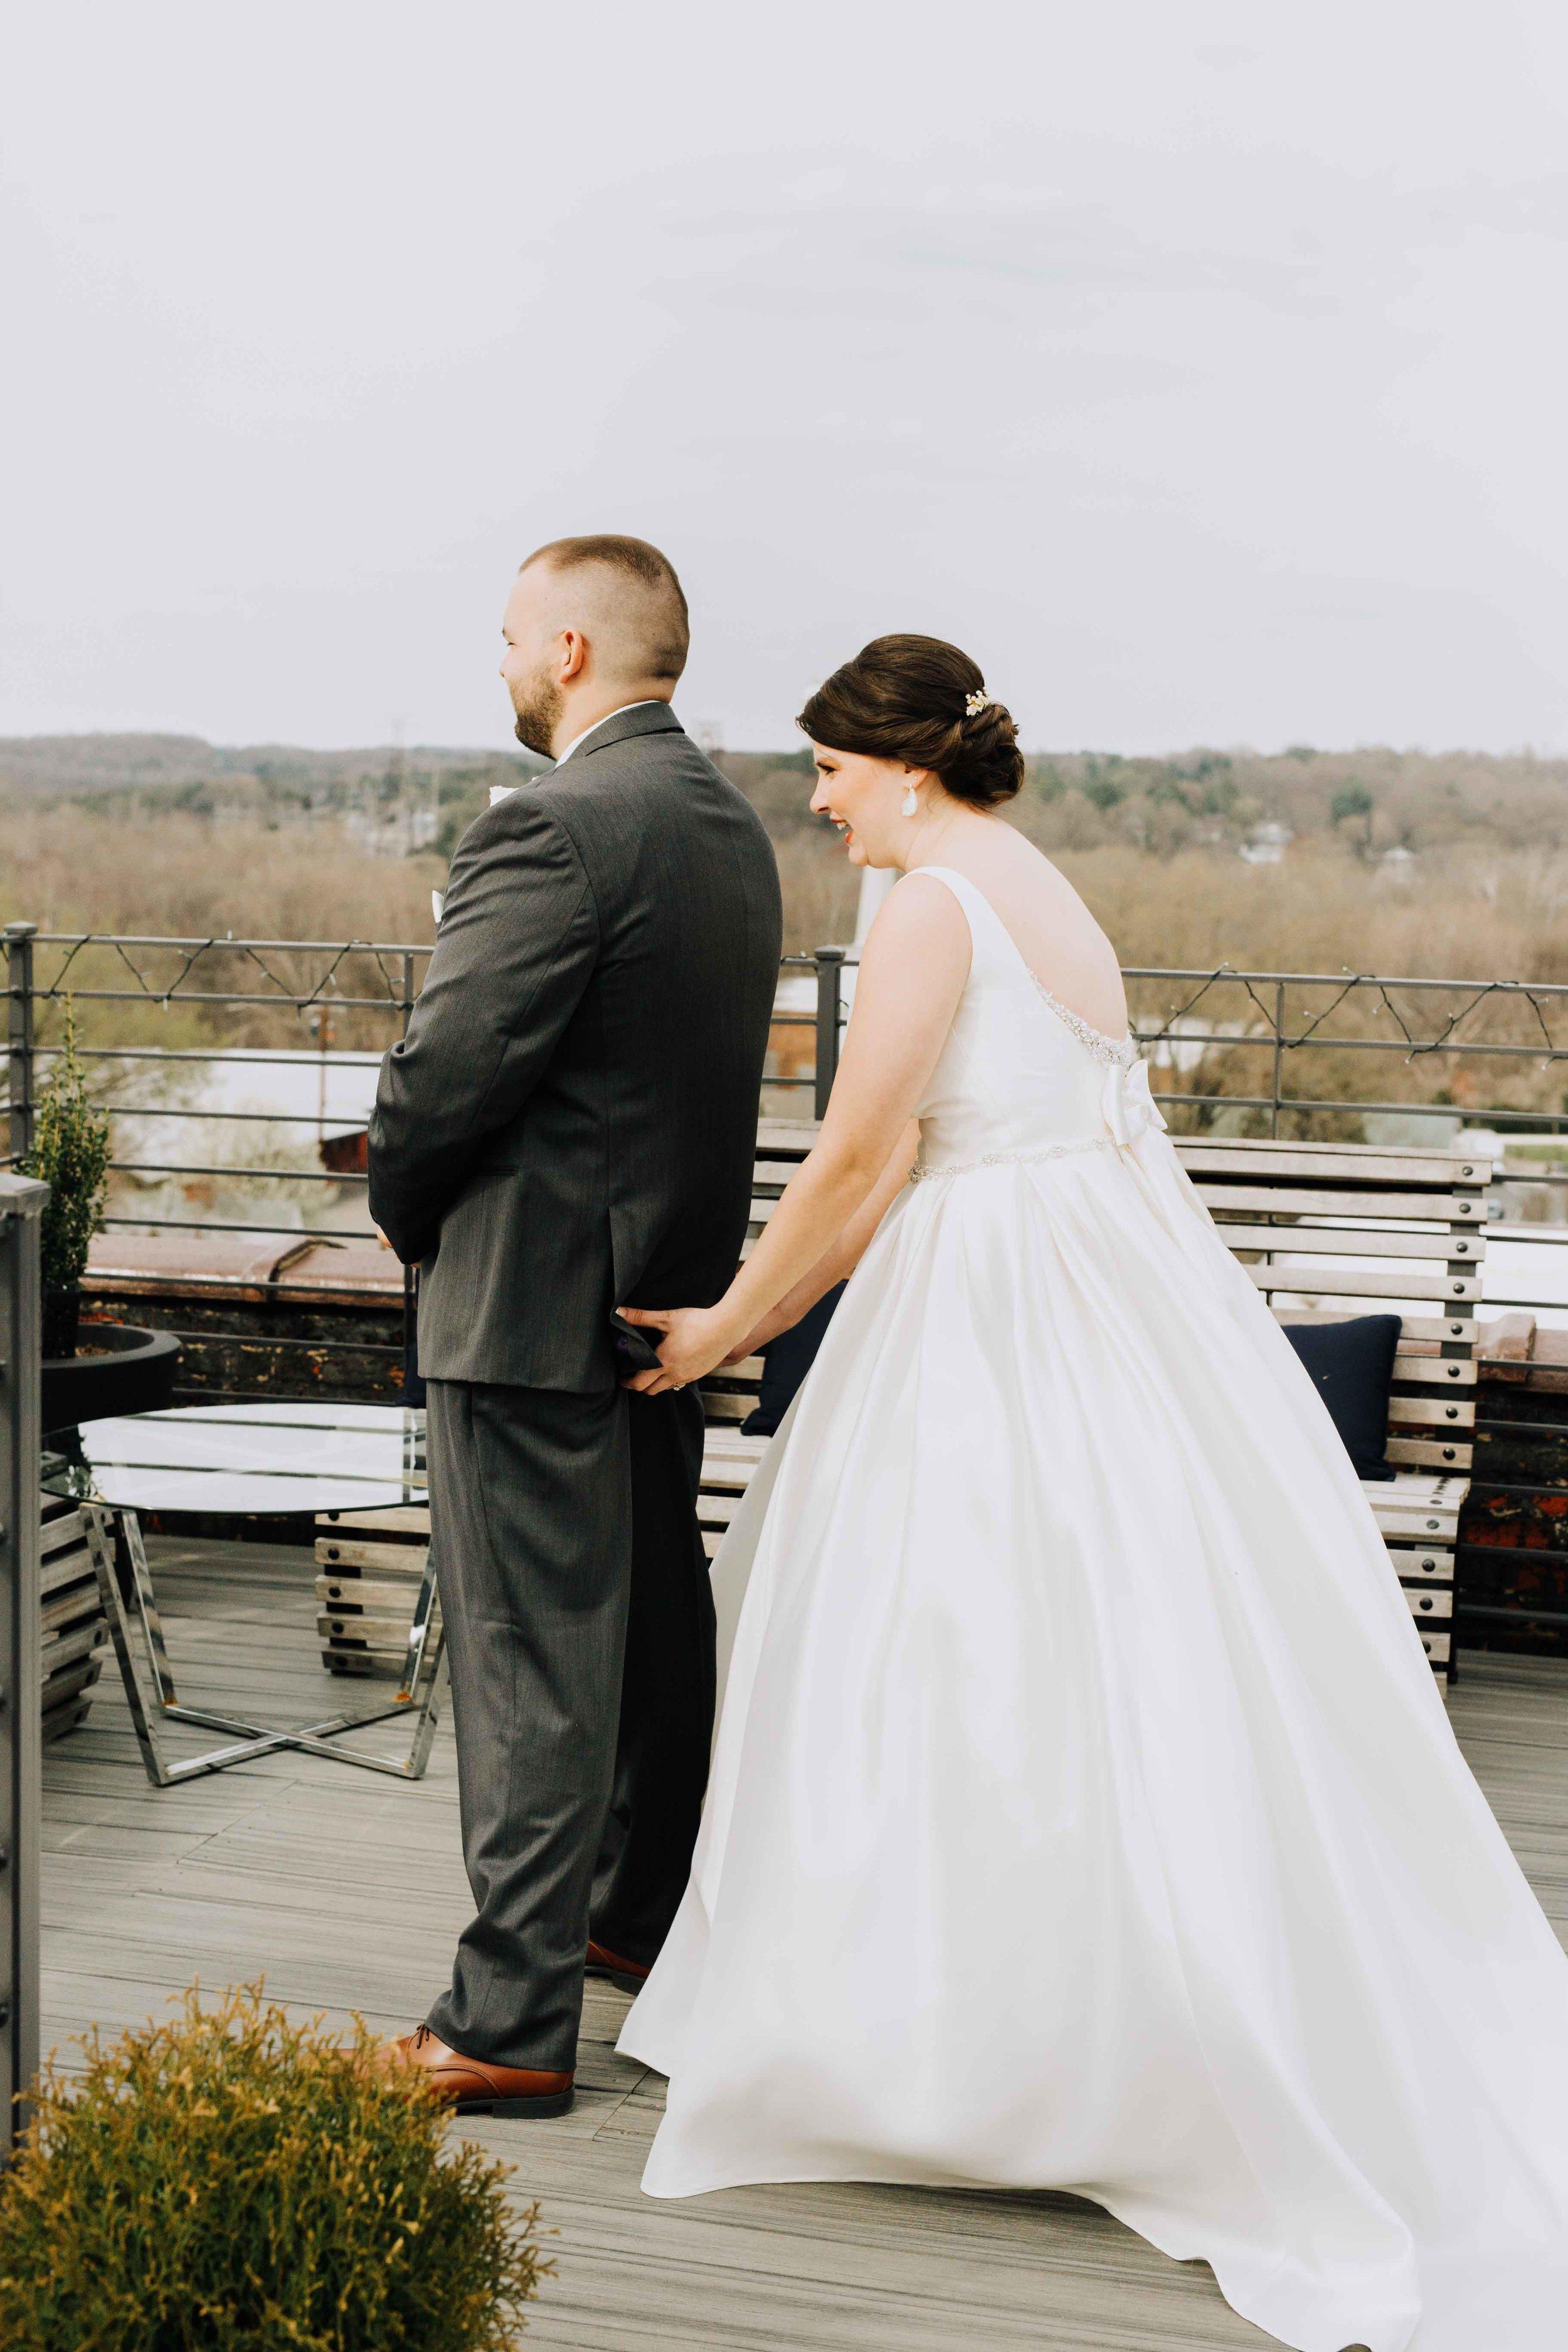 Farmville-Virginia-Wedding-Hotel-Weynoke-Downtown-Jacqueline-Waters-Photography-Detailed- (466).jpg